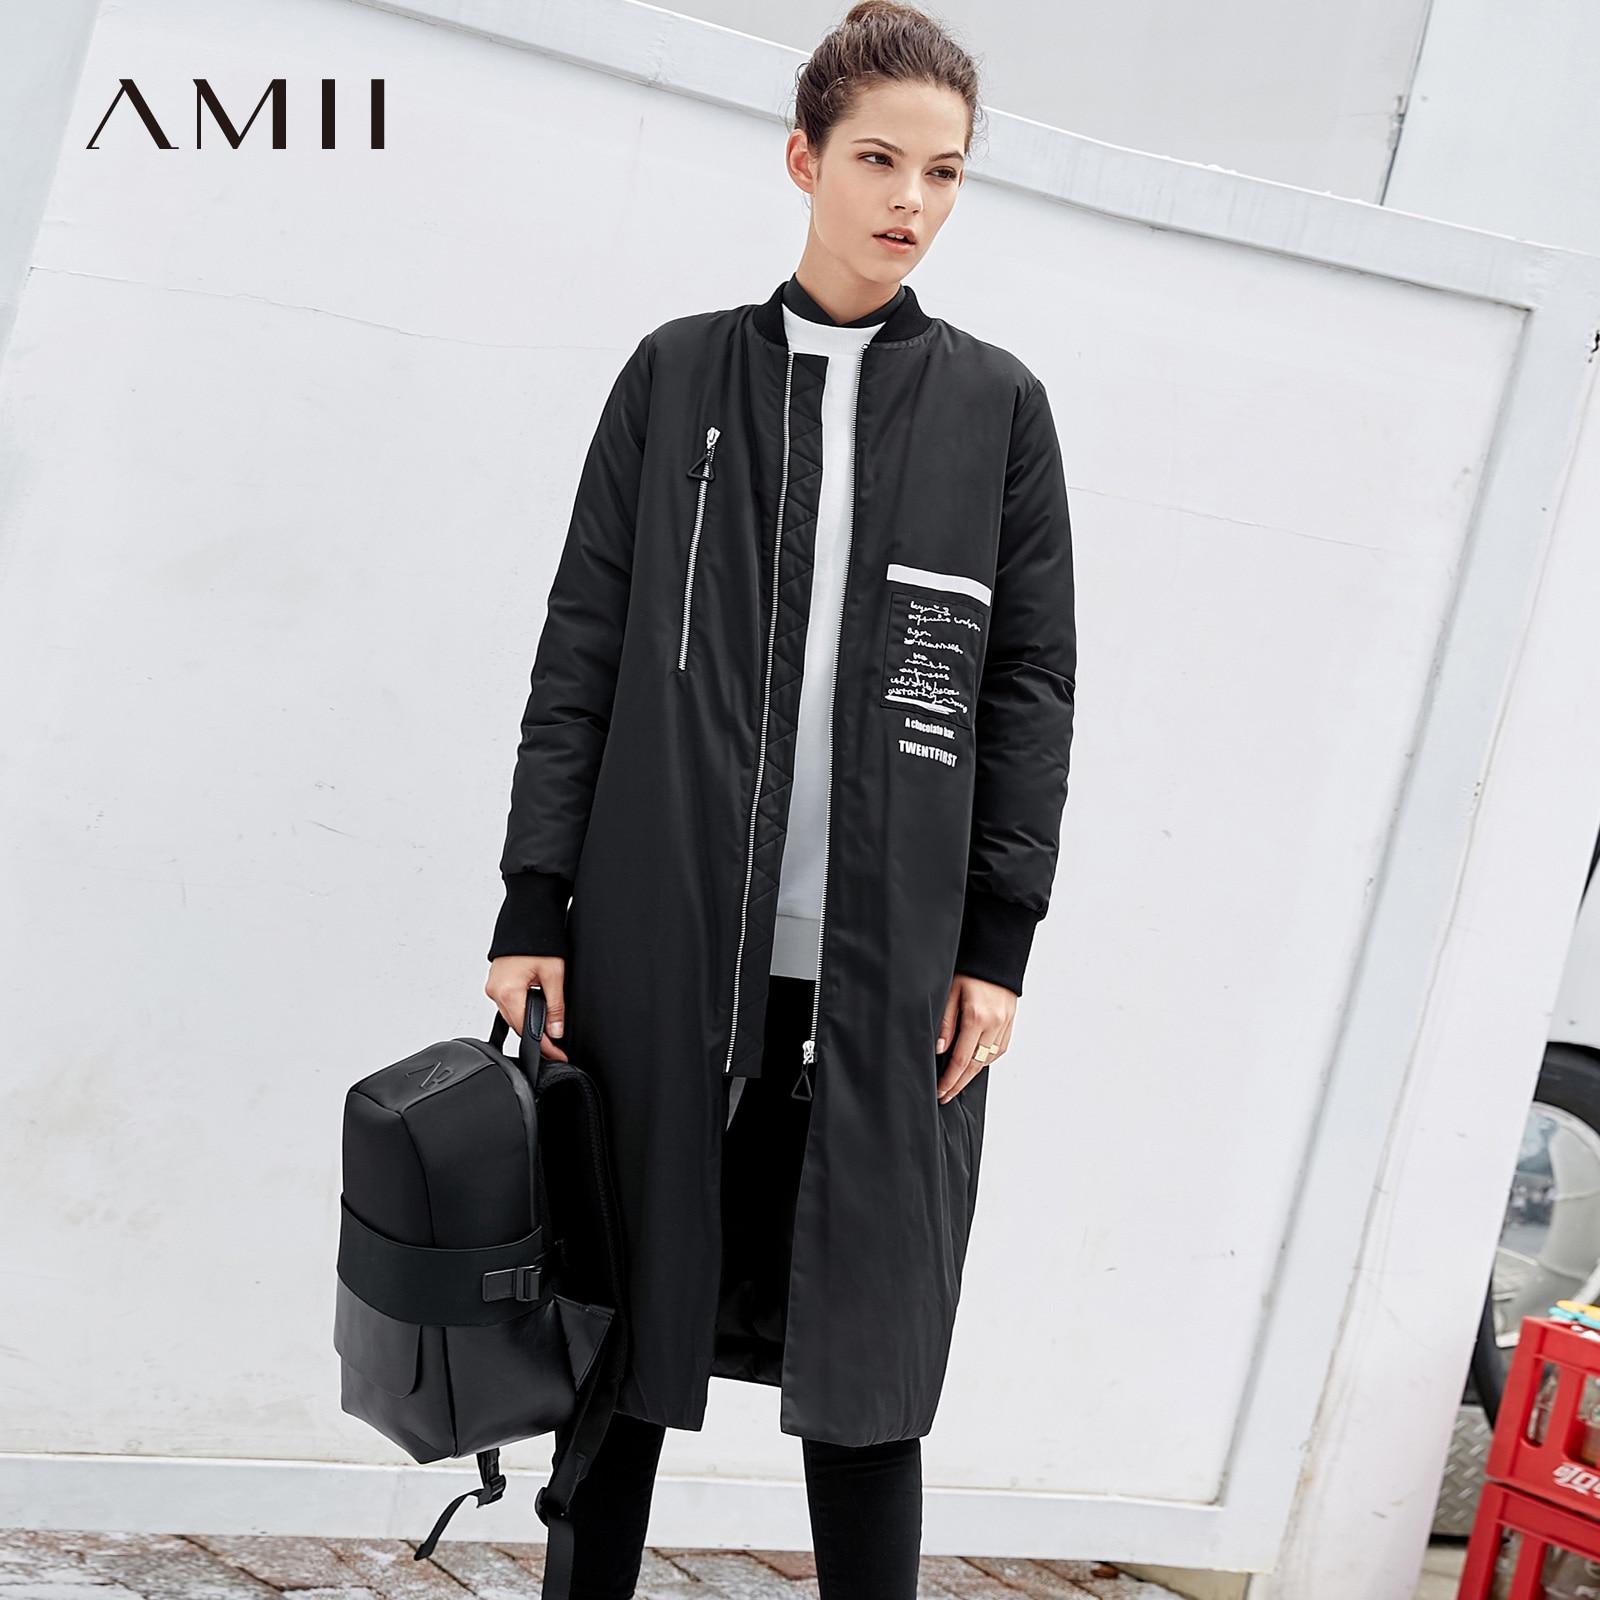 Amii Women 2018 Winter Embroidery 90 White Duck Down Coat Female Fashion Light Jacket Coats